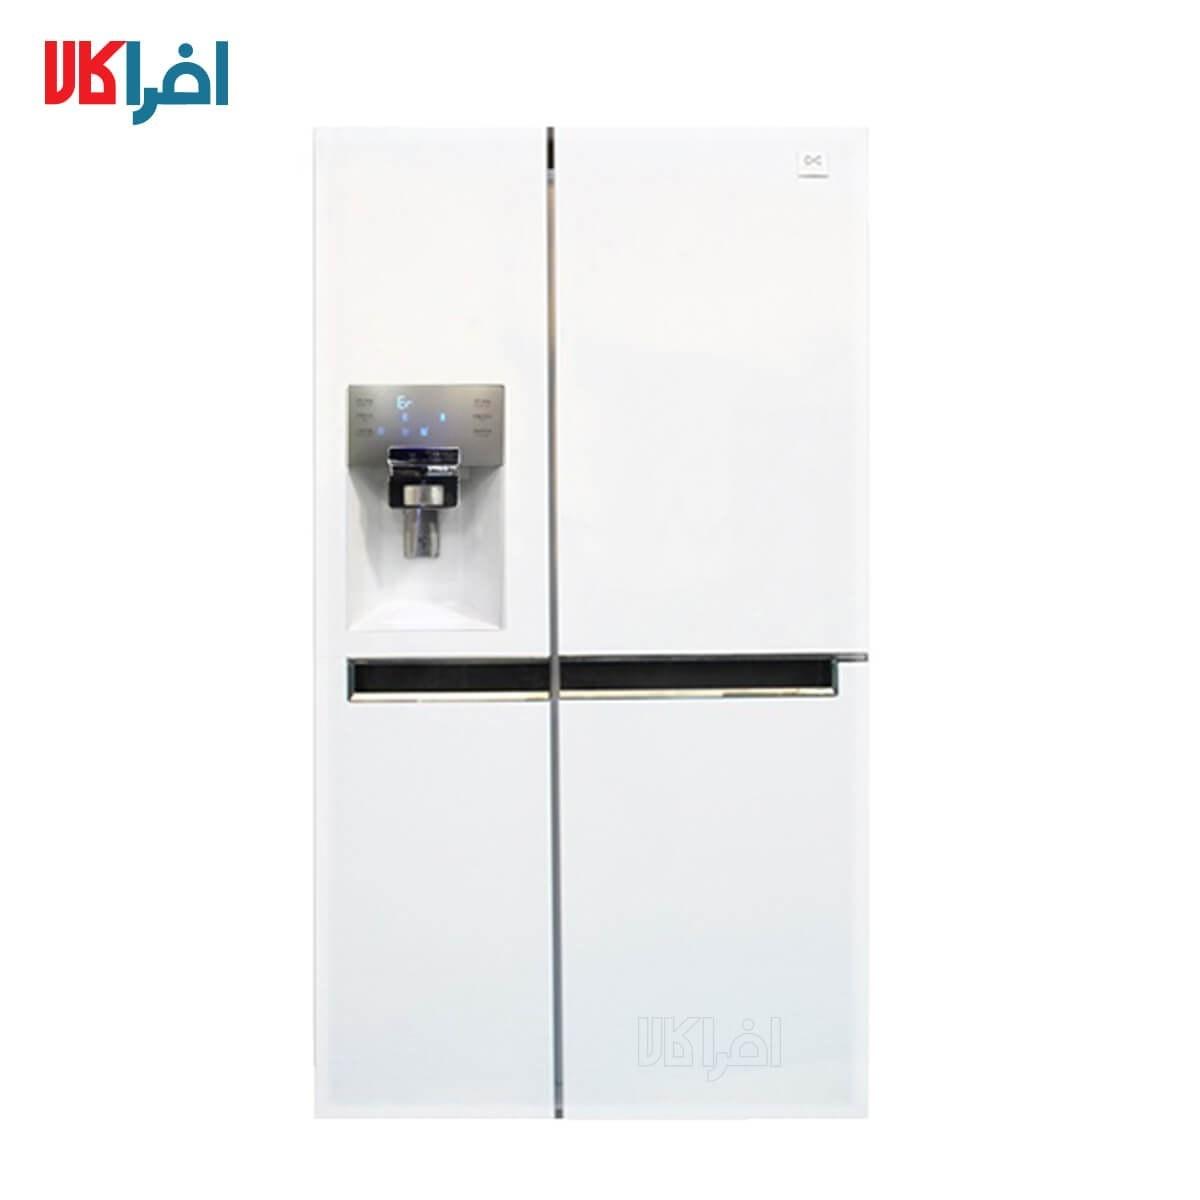 عکس یخچال و فریزر ساید بای ساید دوو مدل D2S-0036 Daewoo D2S-0036 Side By Side Refrigerator یخچال-و-فریزر-ساید-بای-ساید-دوو-مدل-d2s-0036